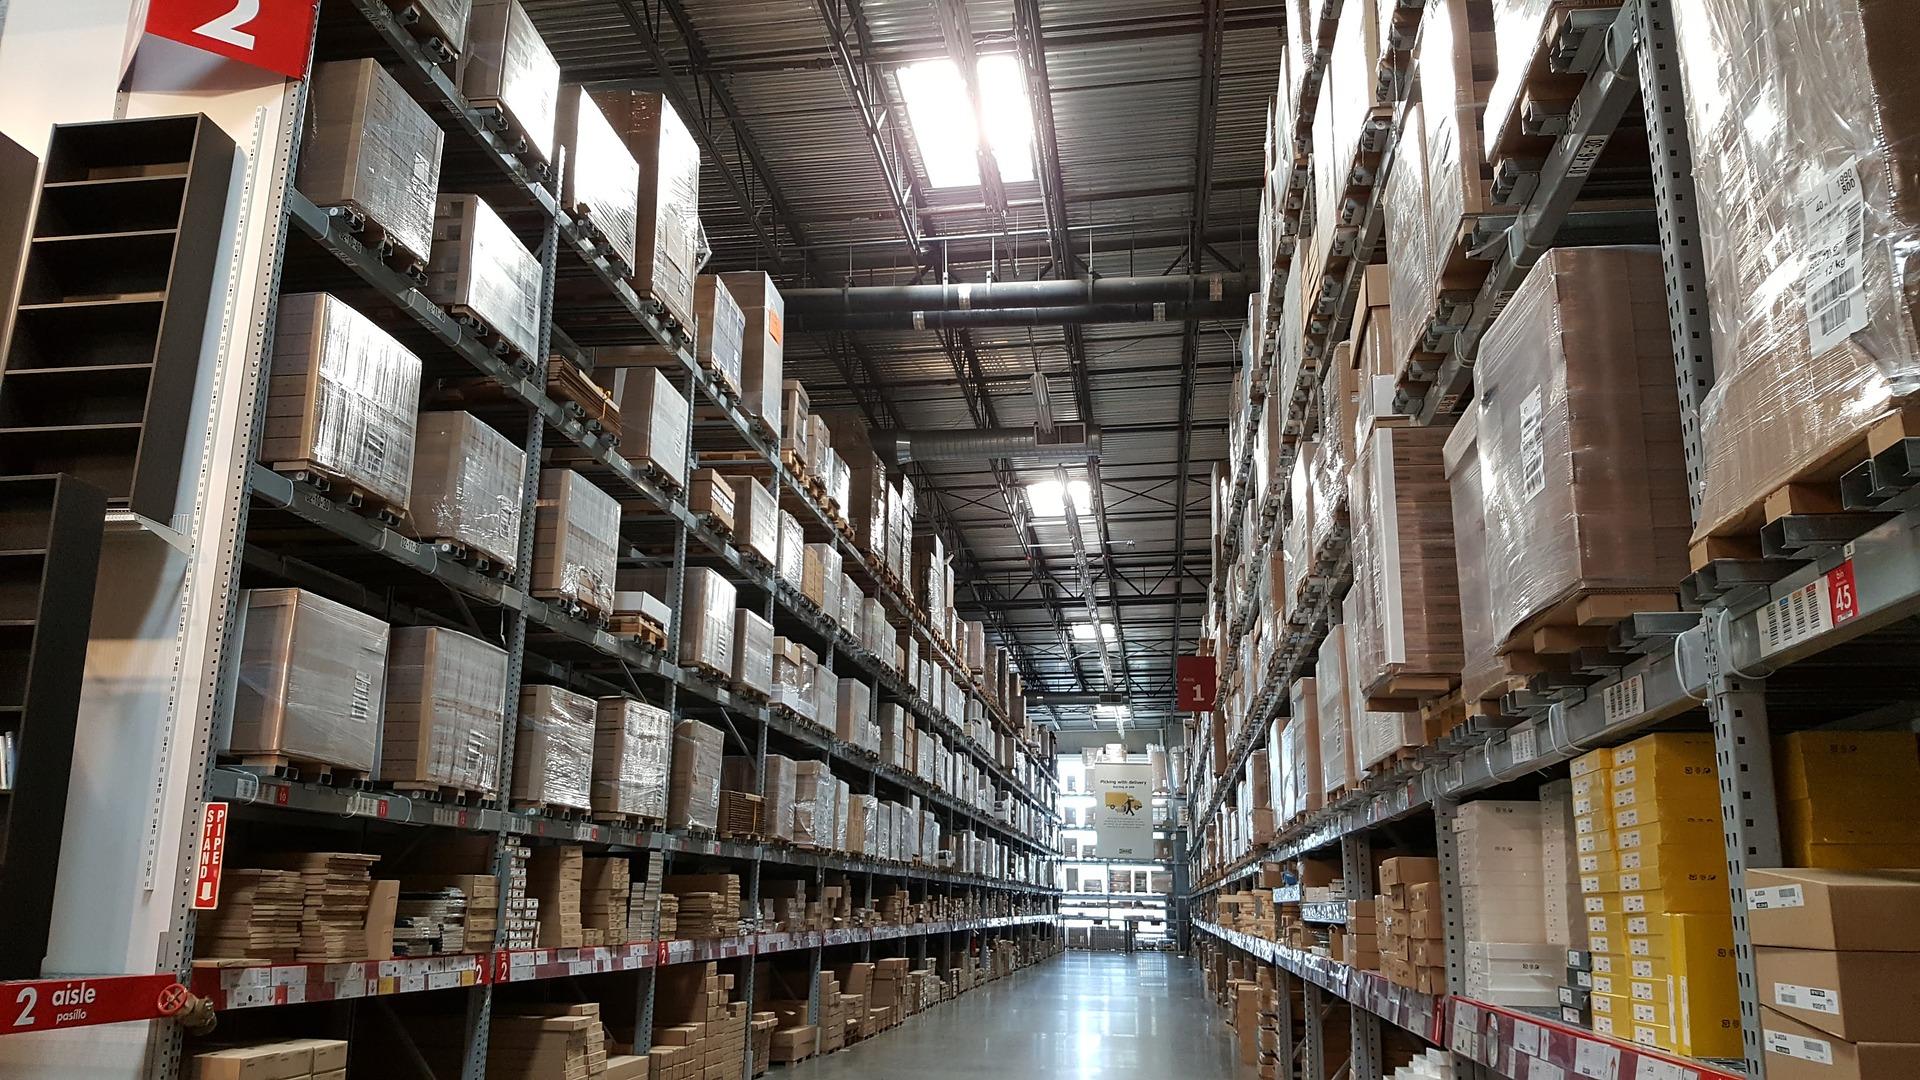 20170922 - warehouse.jpg